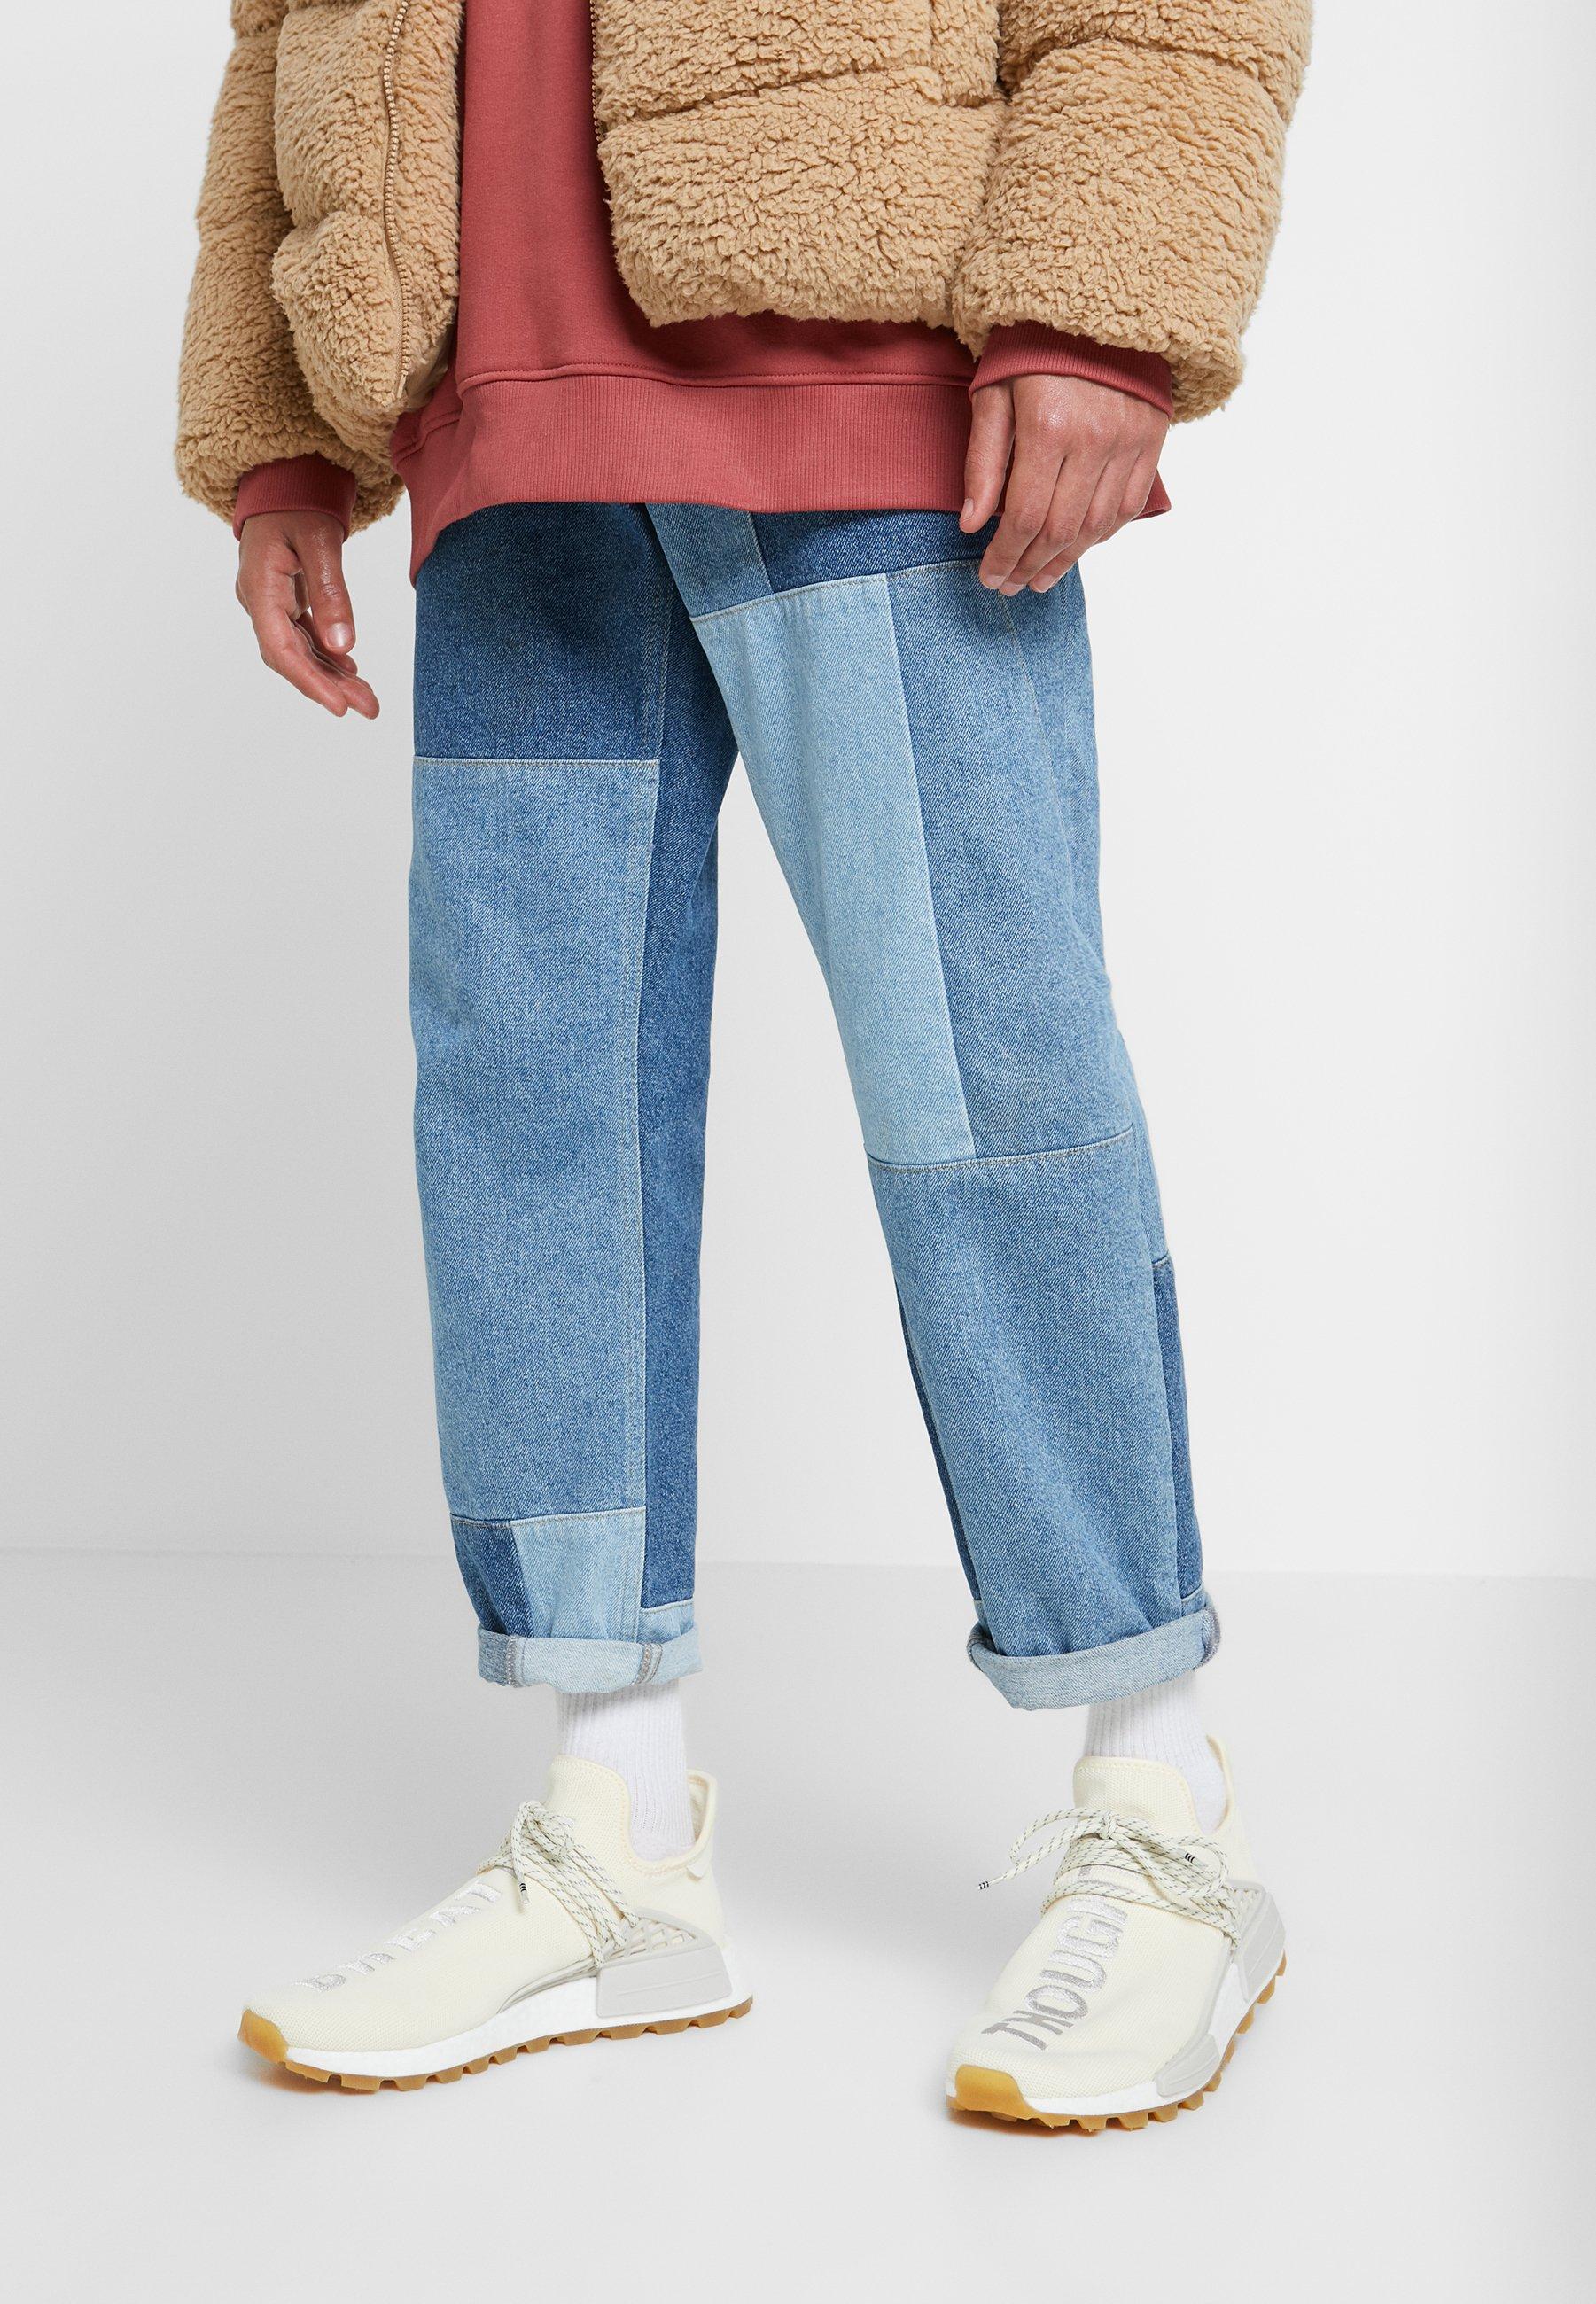 White Williams Adidas Nmd Basse White raw Originals Pharrell Hu PrdSneakers rdtshQ